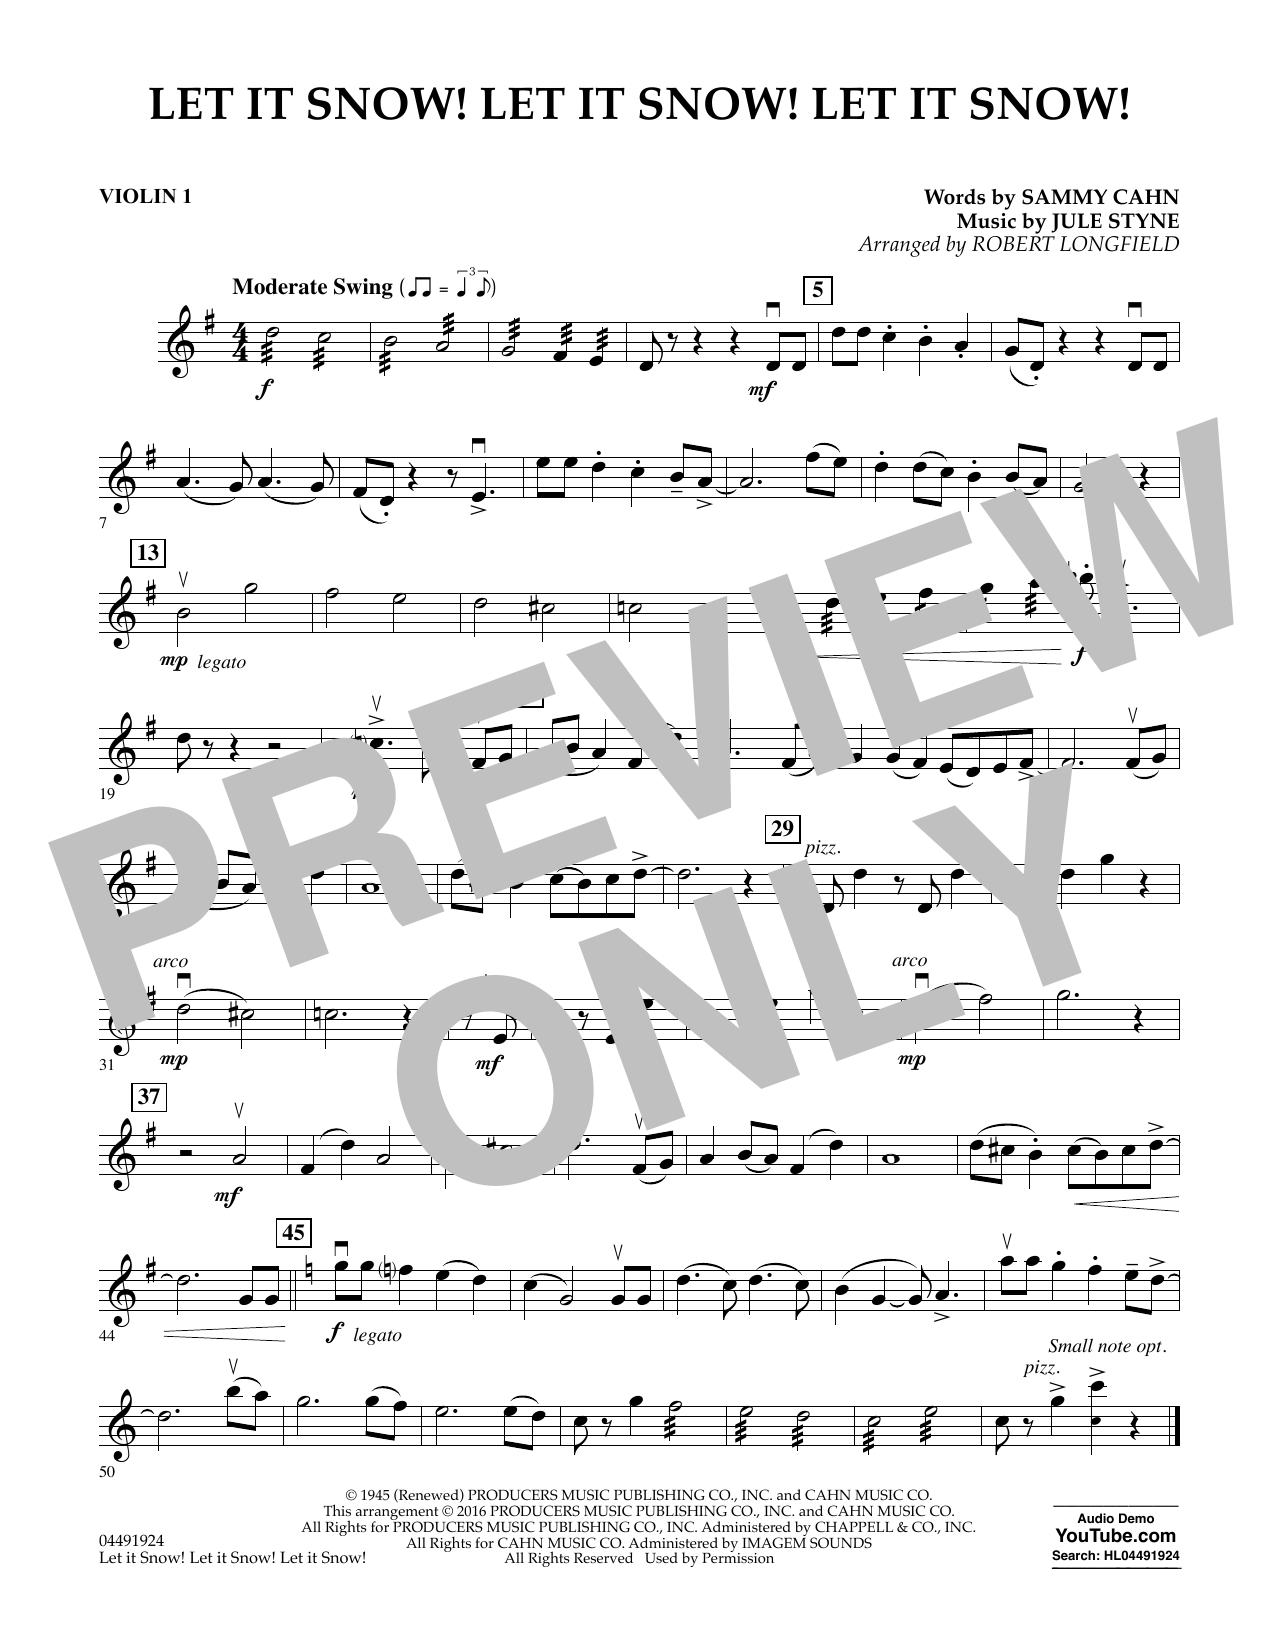 Let It Snow! Let It Snow! Let It Snow! - Violin 1 Sheet Music